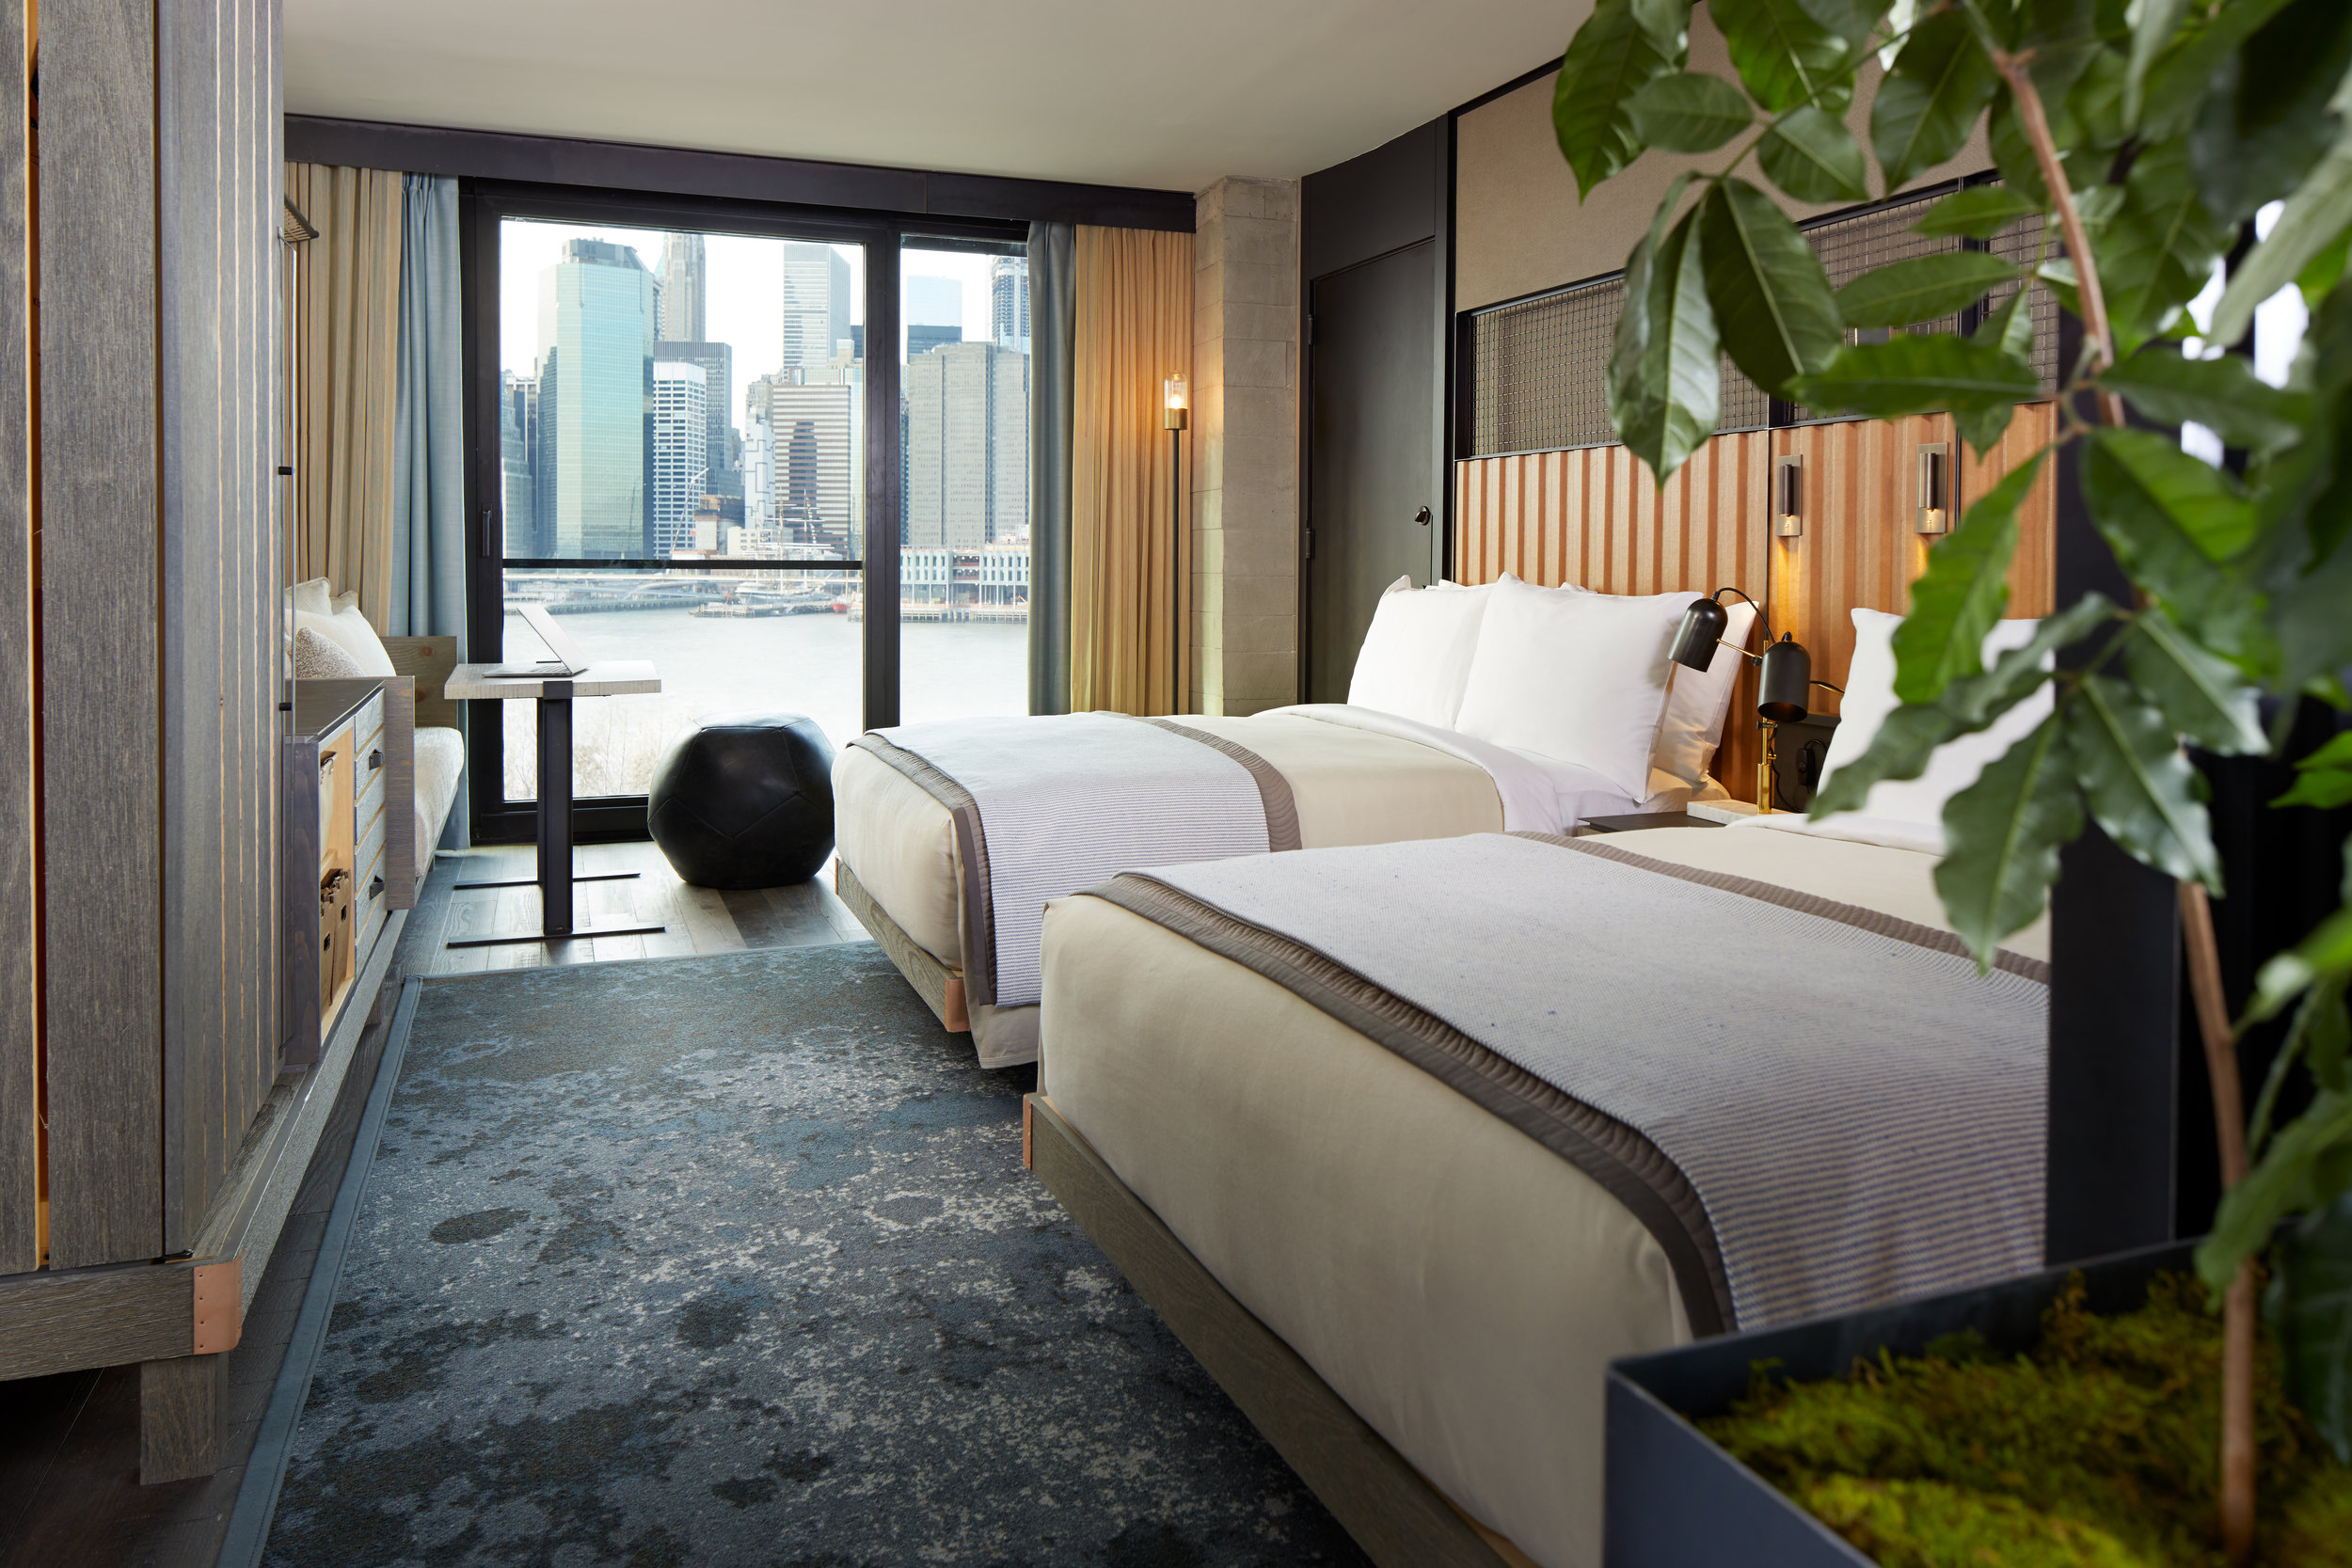 1_Hotel_Brooklyn_Bridge_Skyline_Two_Bed2_HI.0 (1).jpg